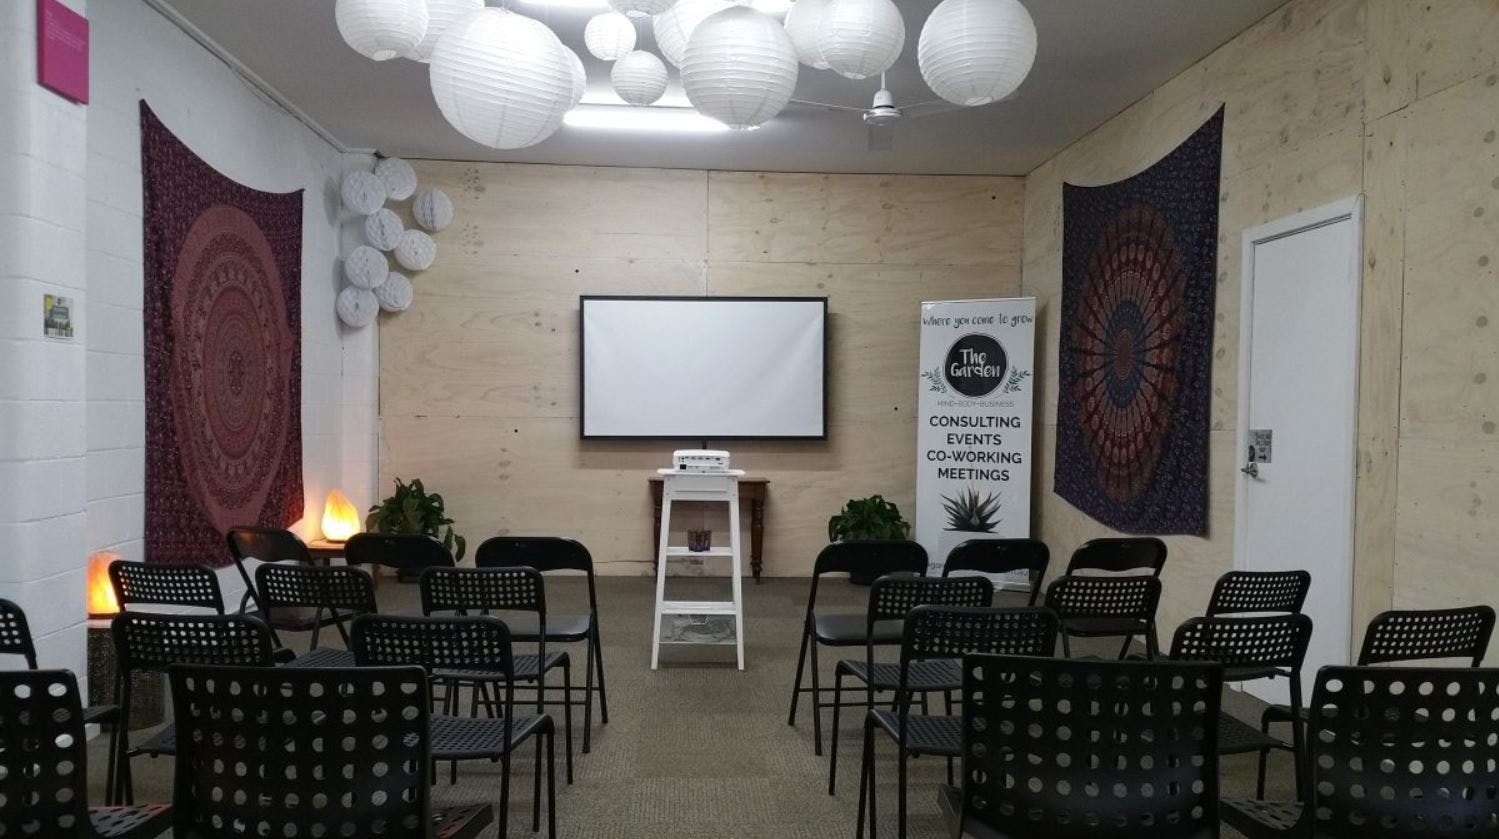 The Bloom Room, workshop at The Garden - Mind Body Business, image 1